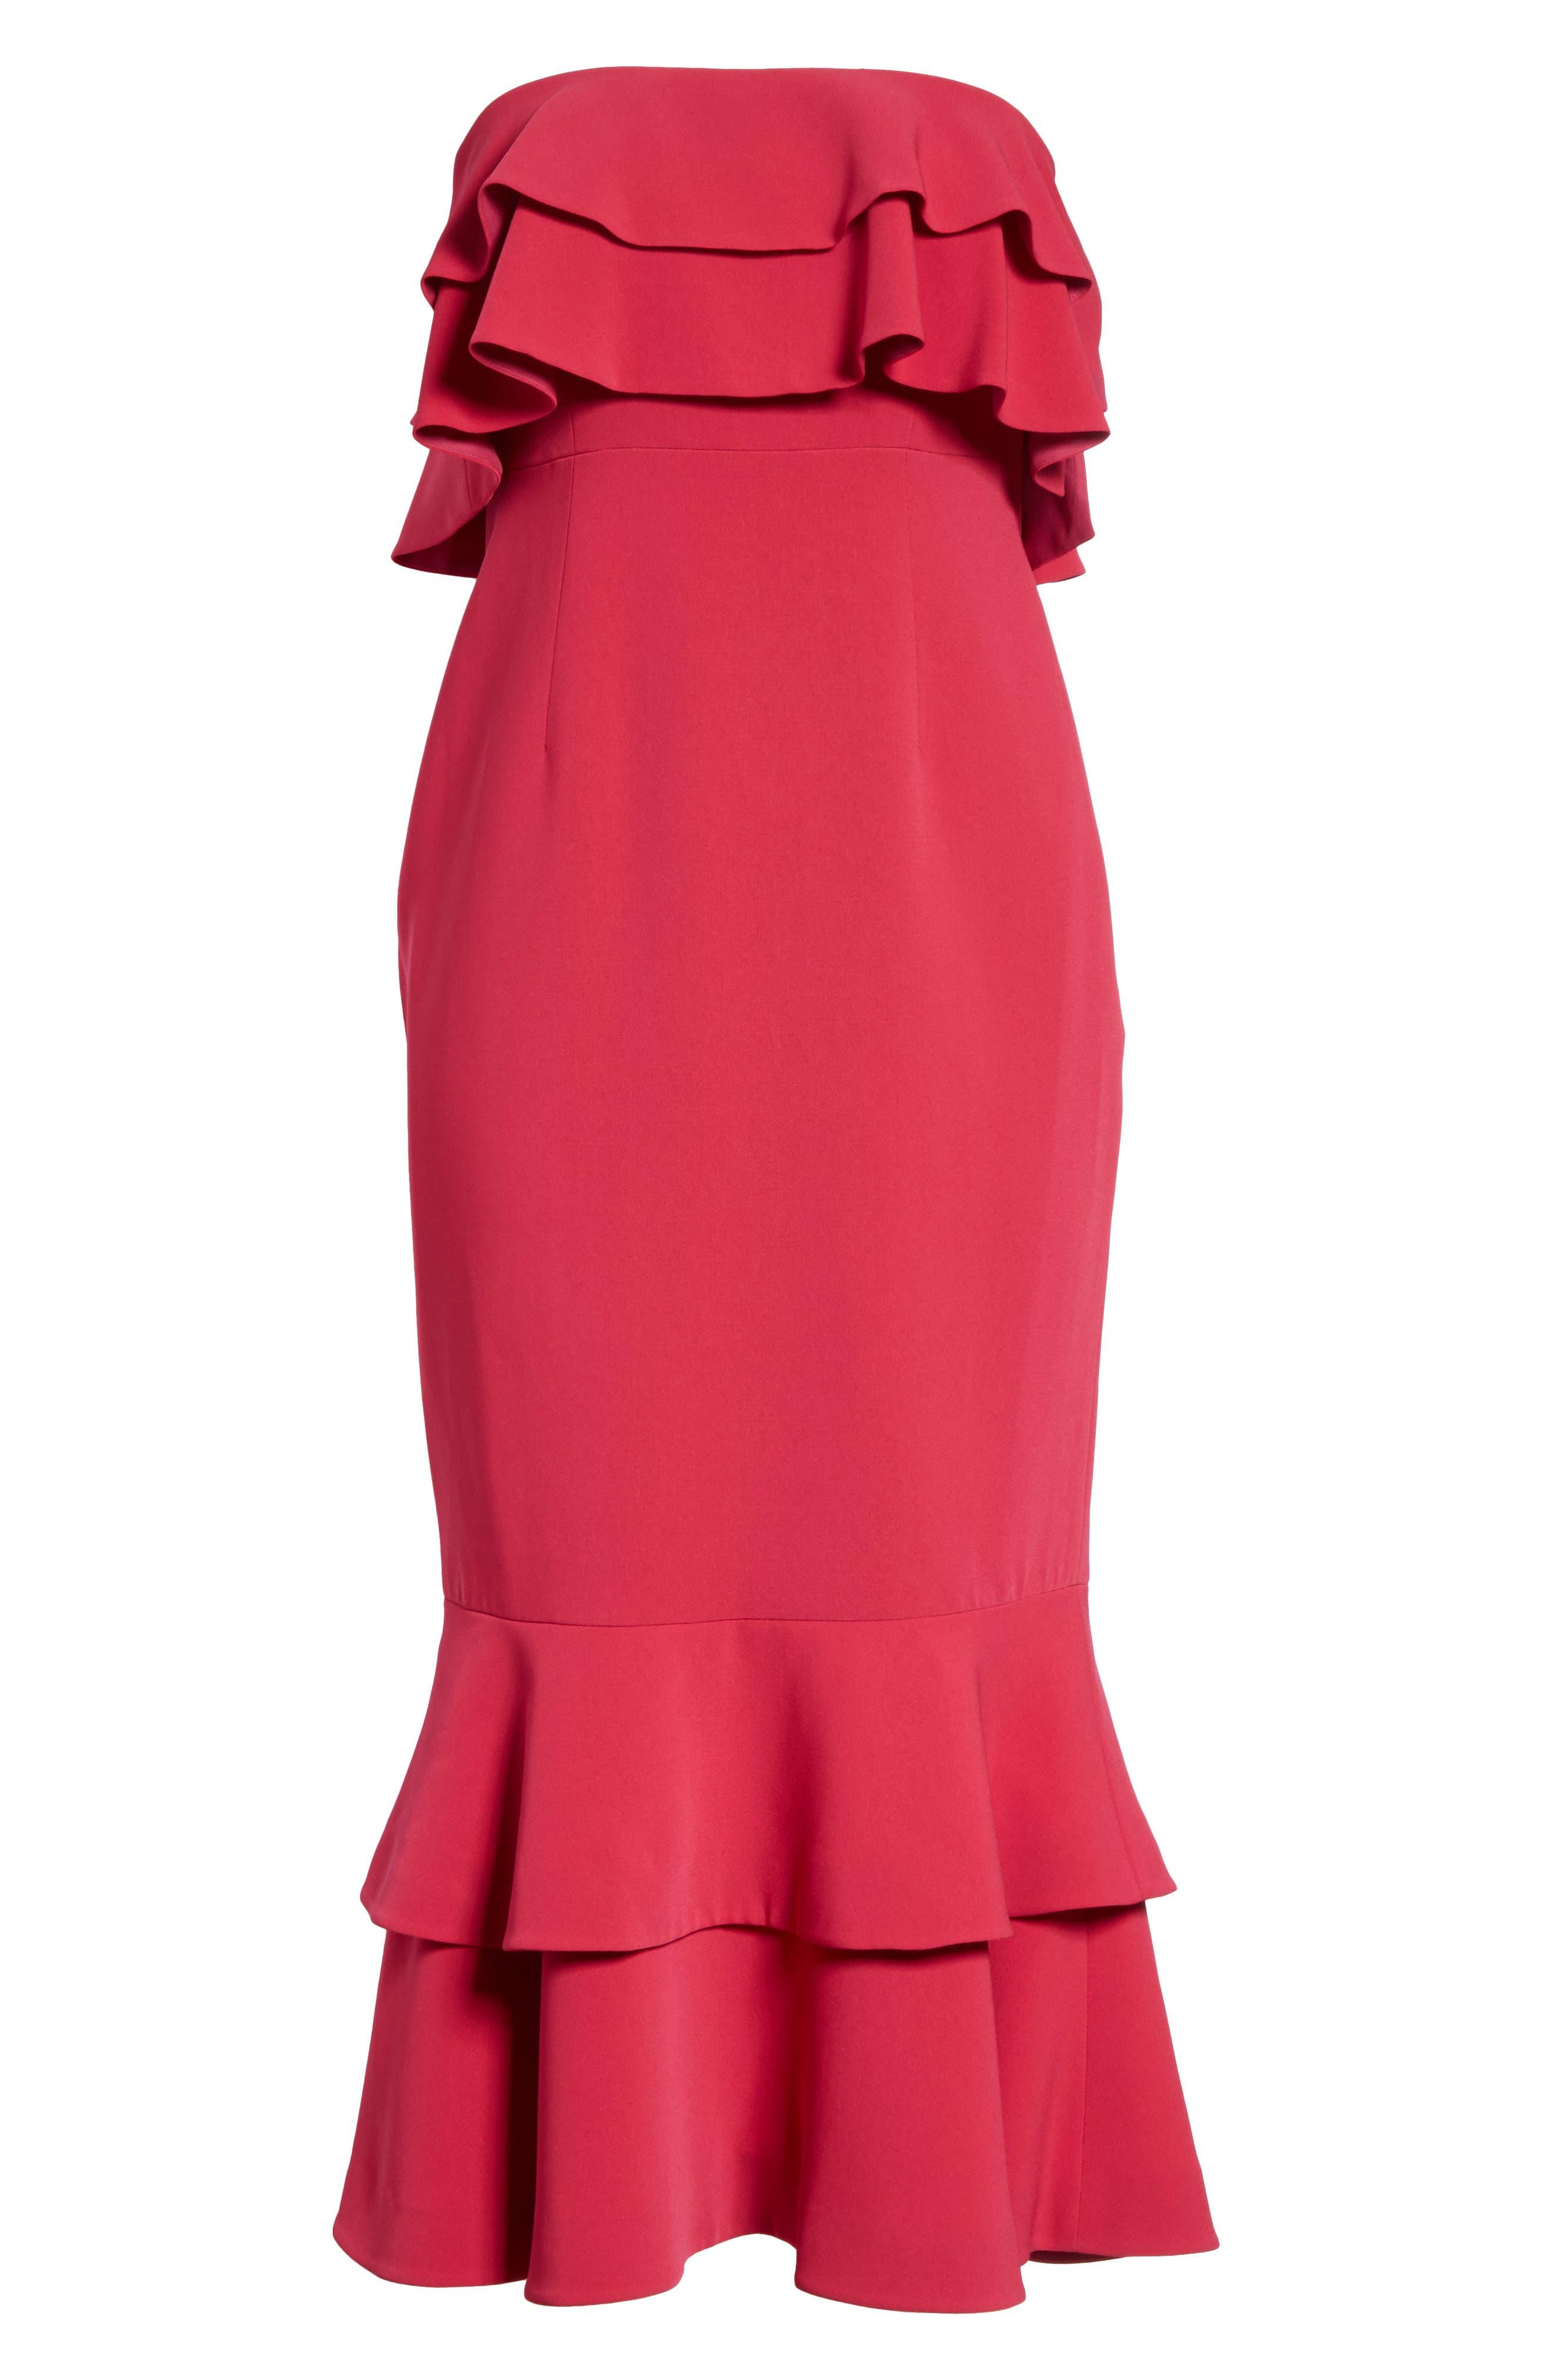 Ezana Ruffle Strapless Mermaid Dress,                             Alternate thumbnail 6, color,                             Cerise